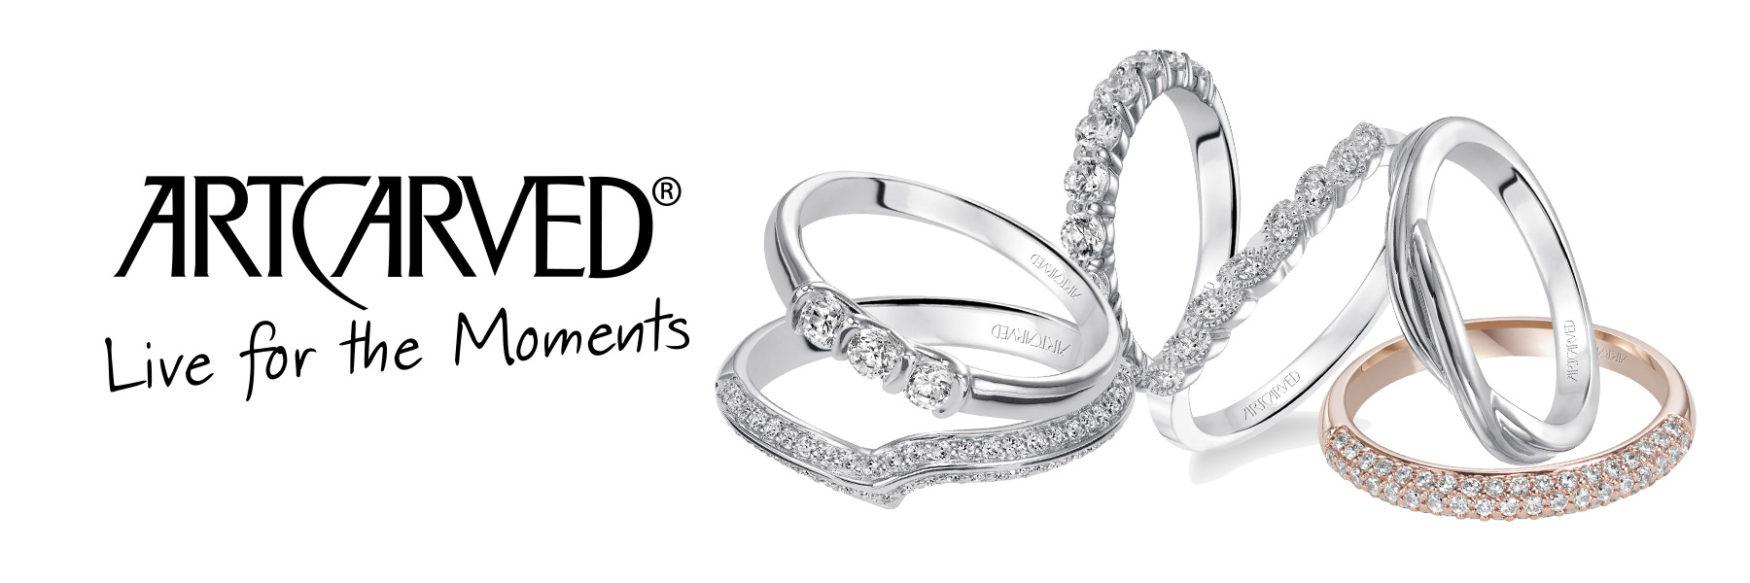 Long Island Wedding Rings - Womens - Art Carved